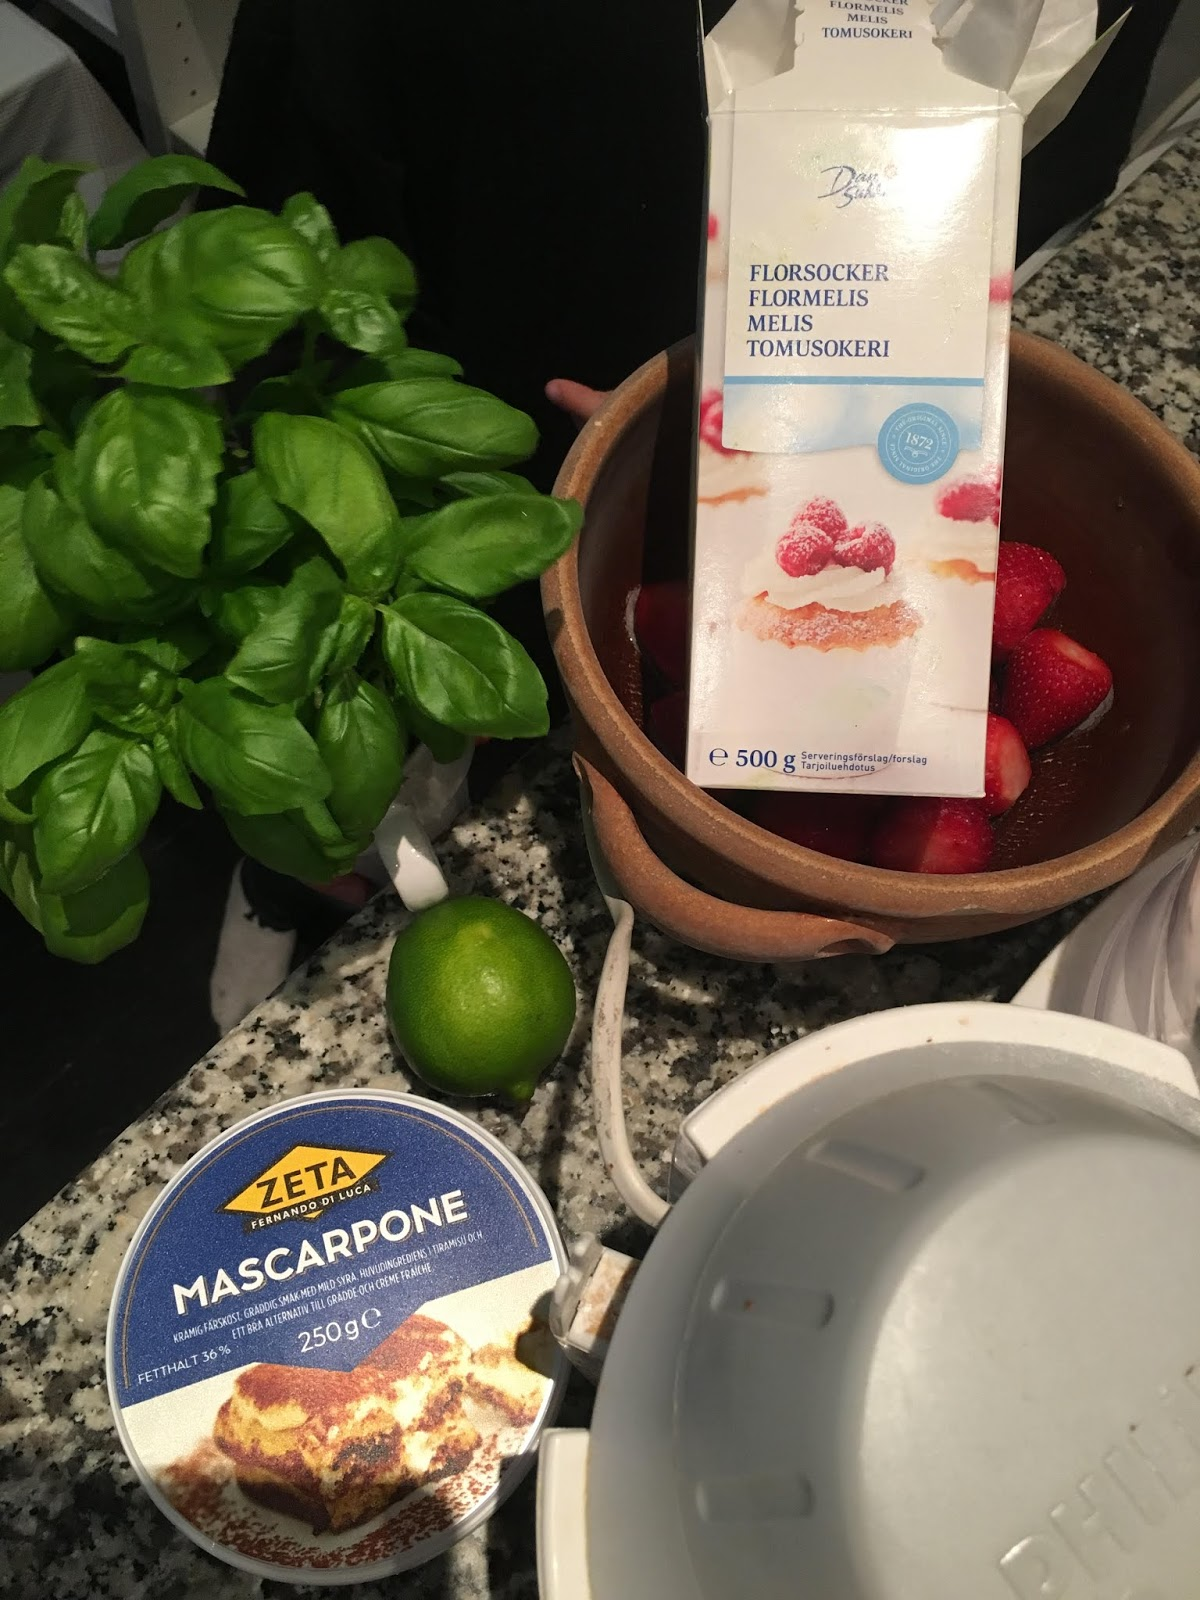 hemmagjord glass med mascarpone